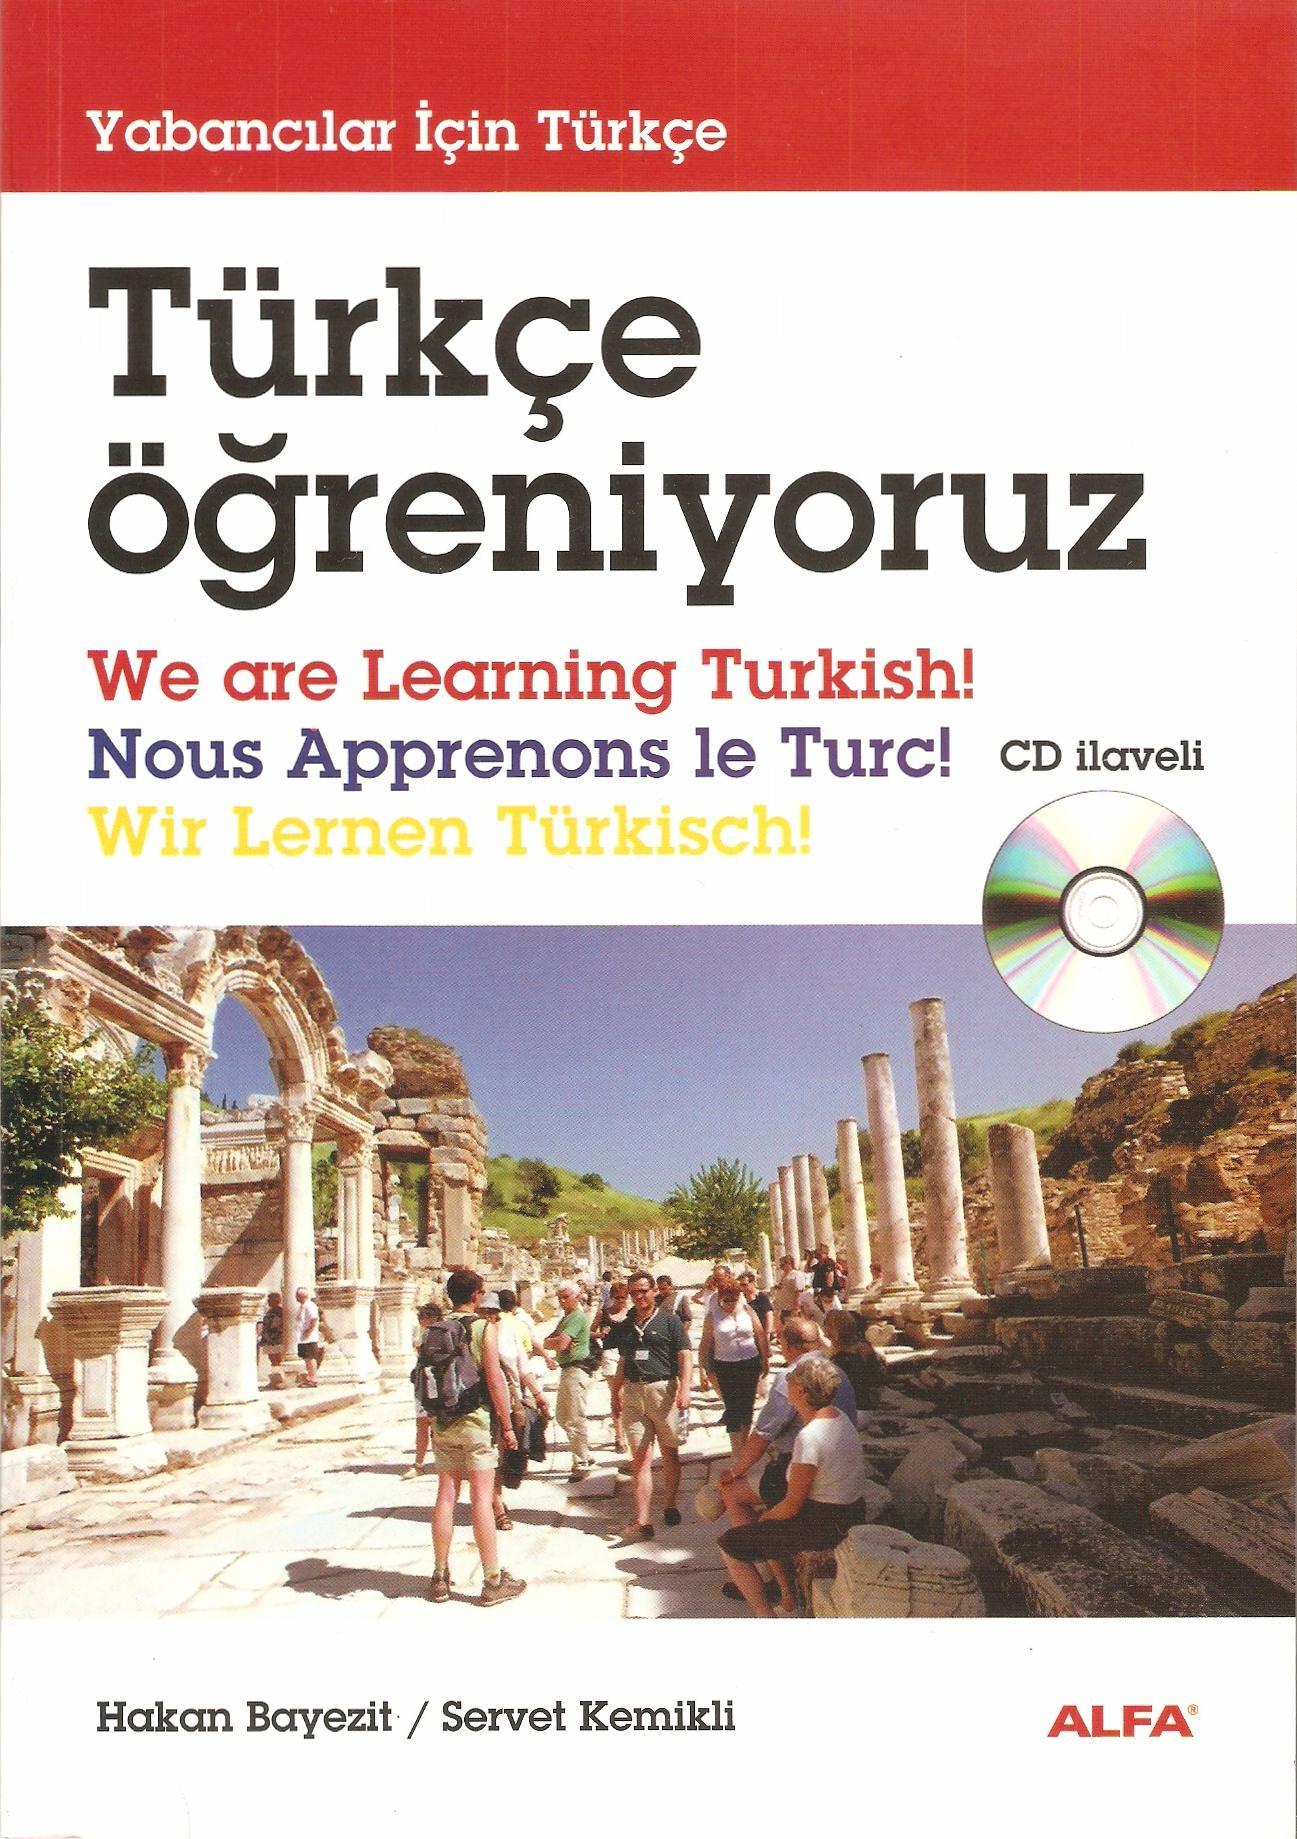 turkce_onkapak.jpg - 348,28 kB